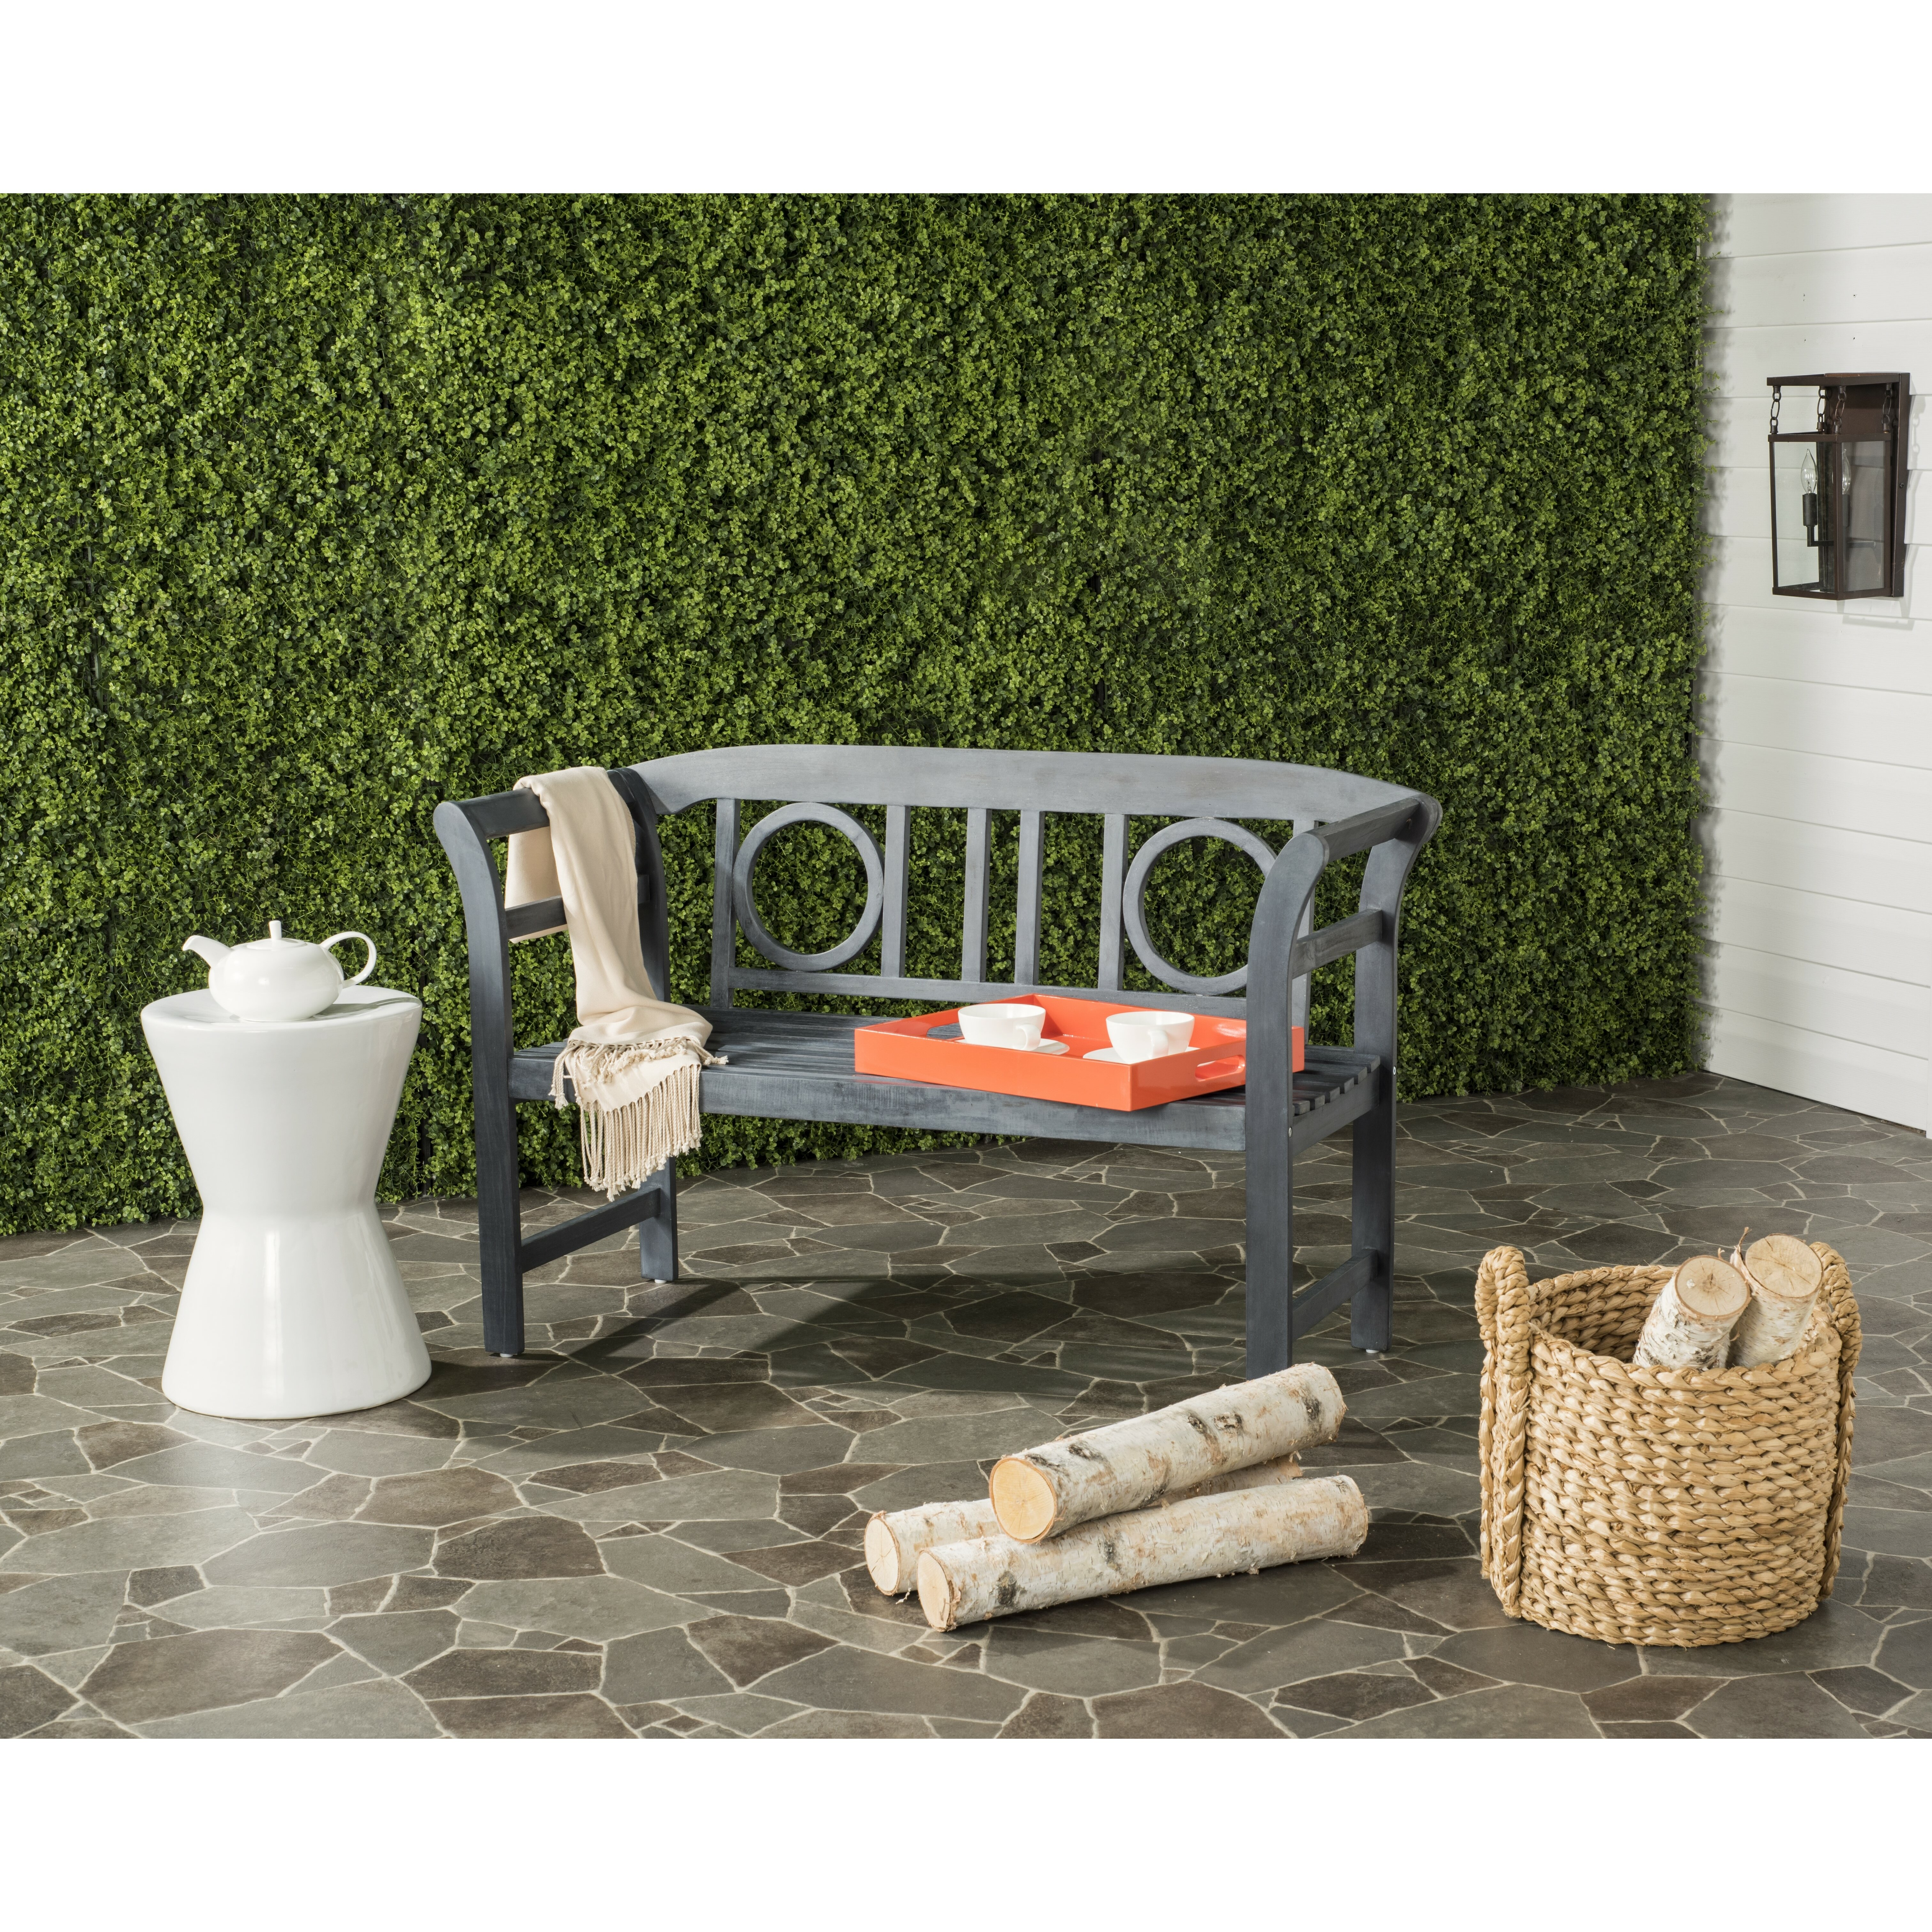 Charlton Home Brinwood 2 Seat Acacia Garden Bench